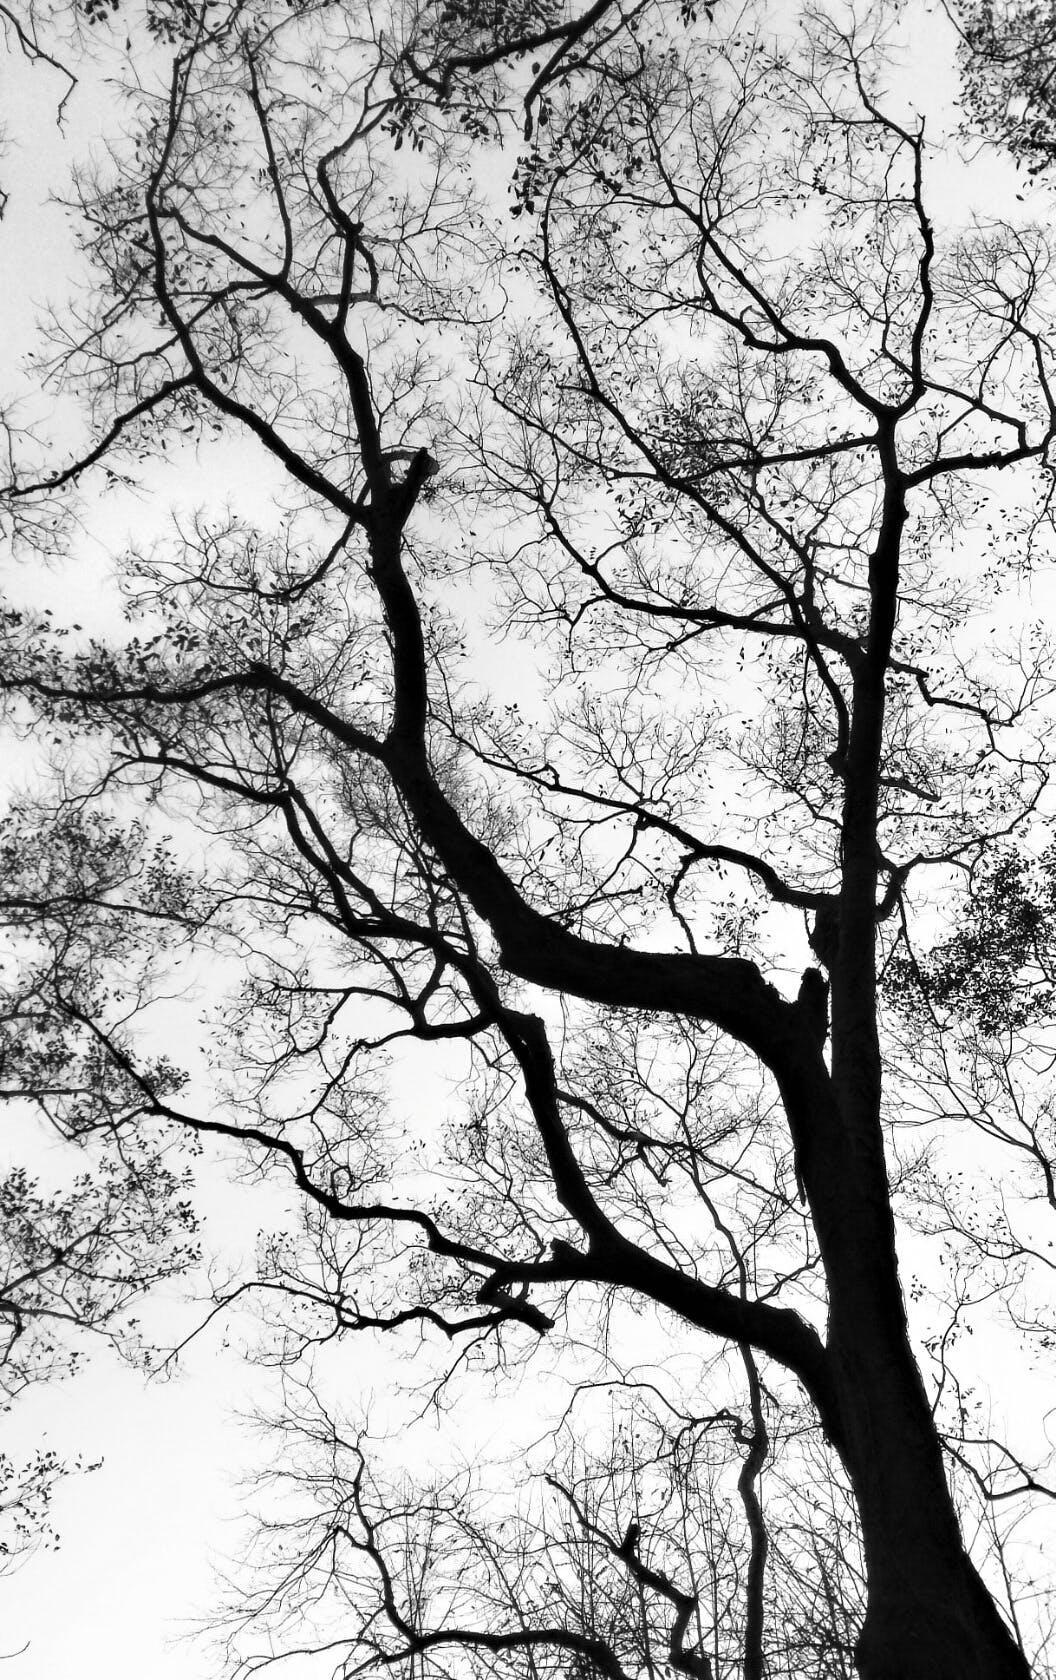 Free stock photo of nature, plant, tree, black